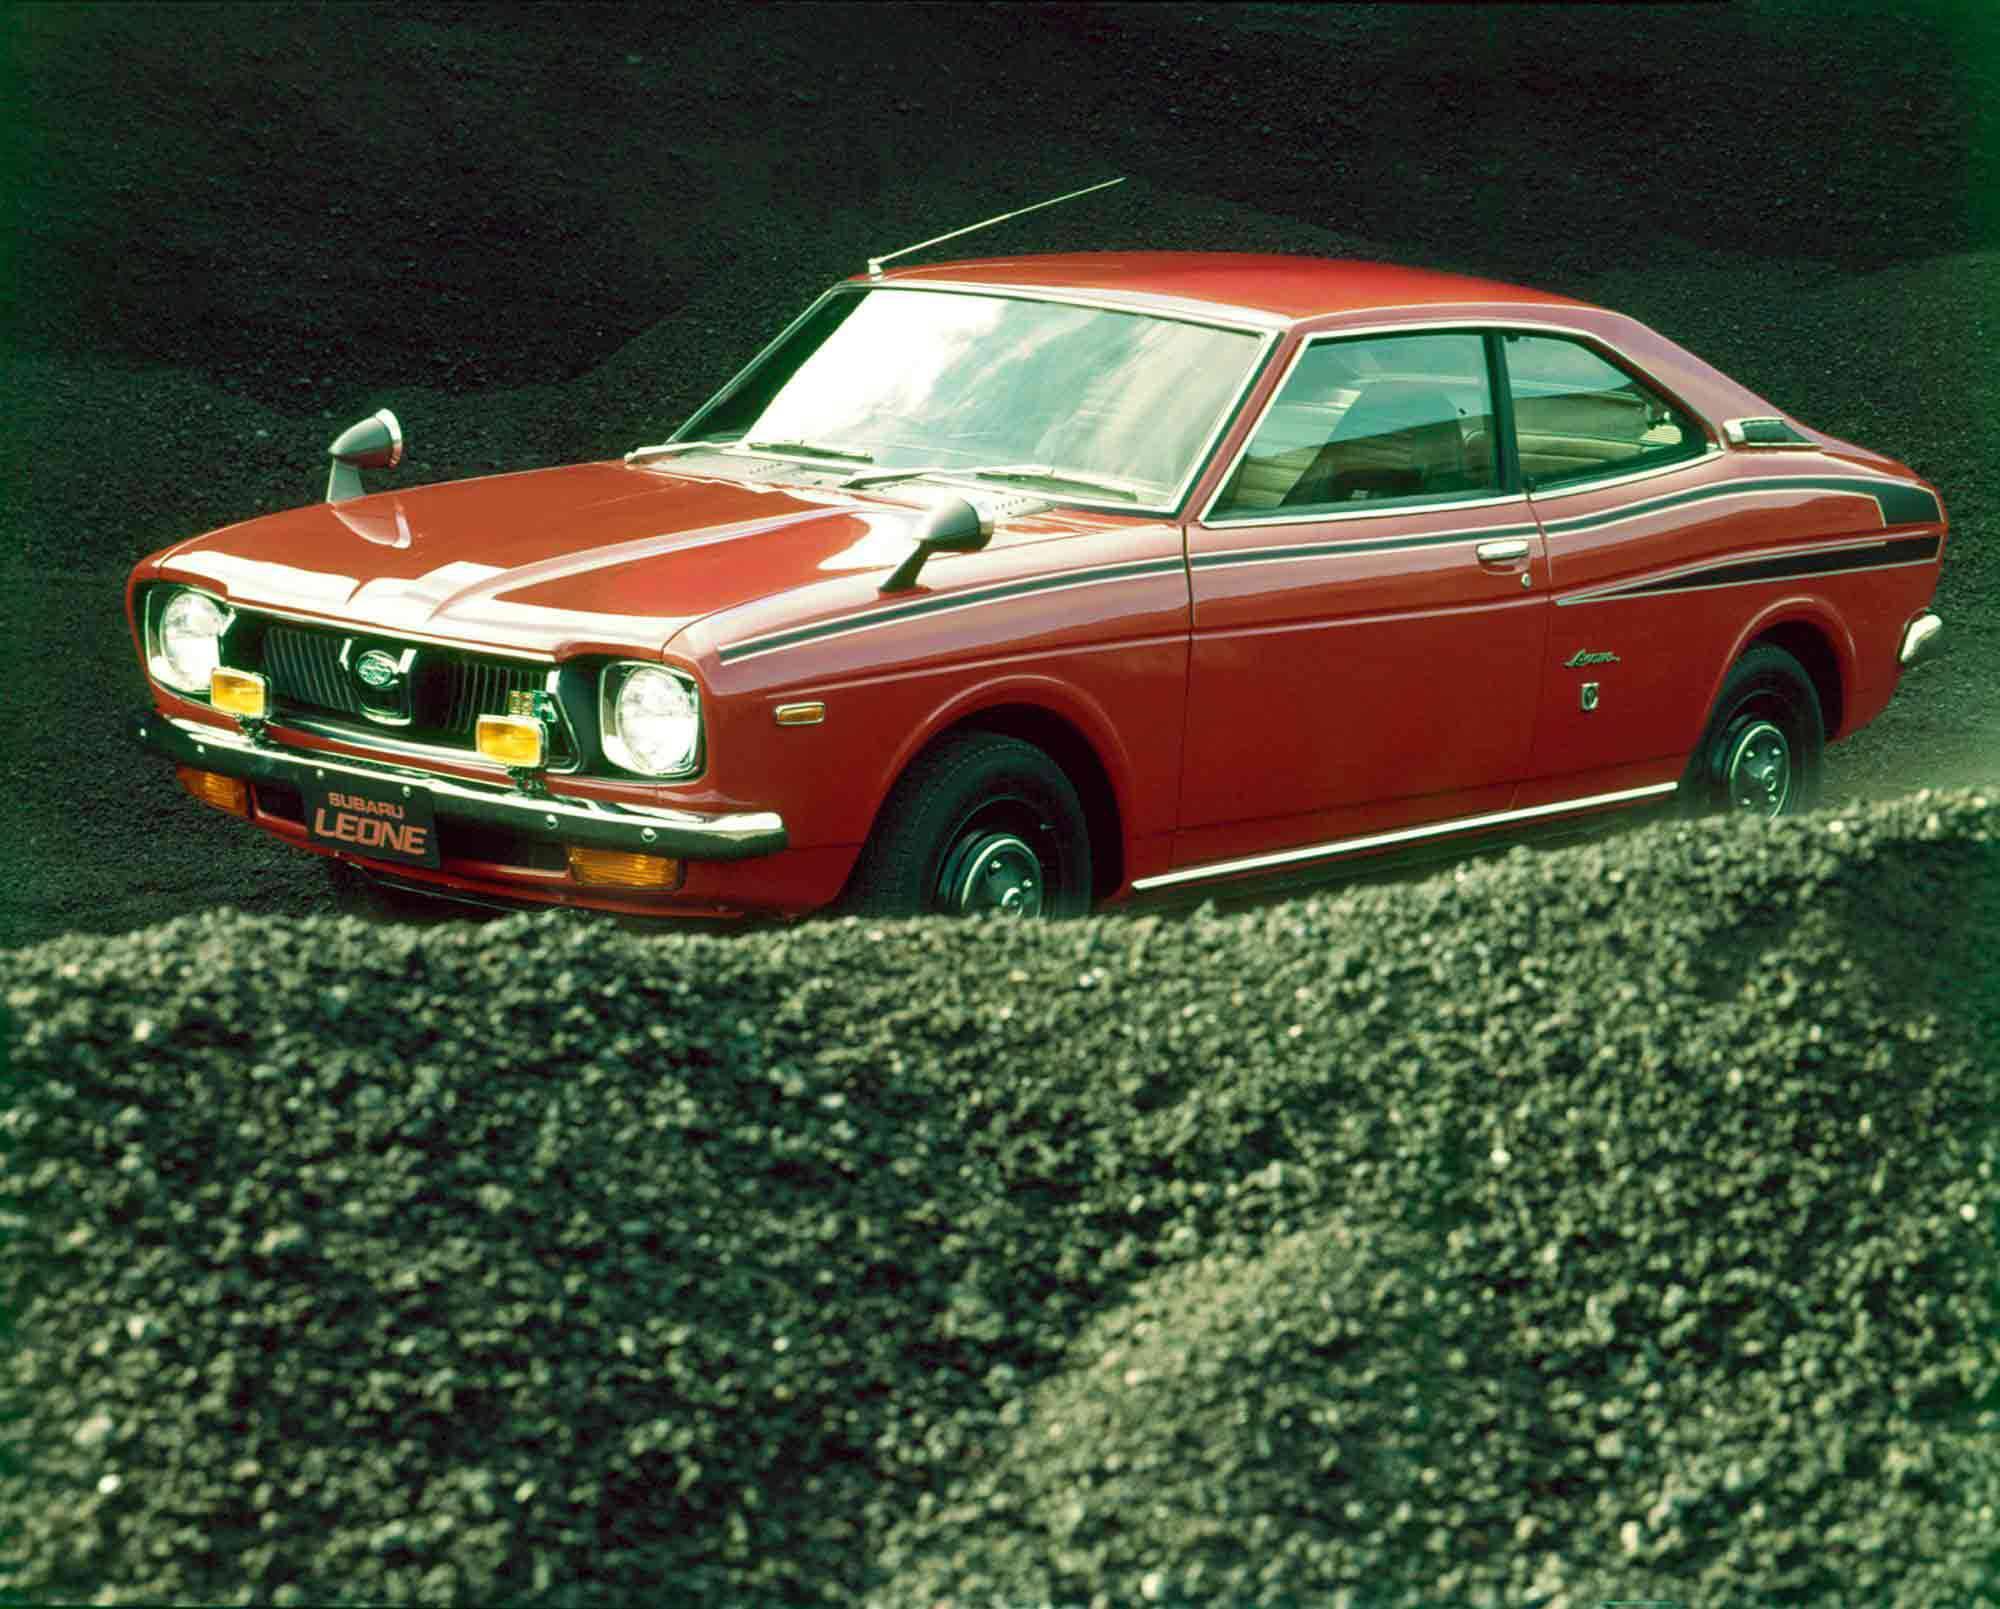 _Subaru-Sport-Coupe-seite4